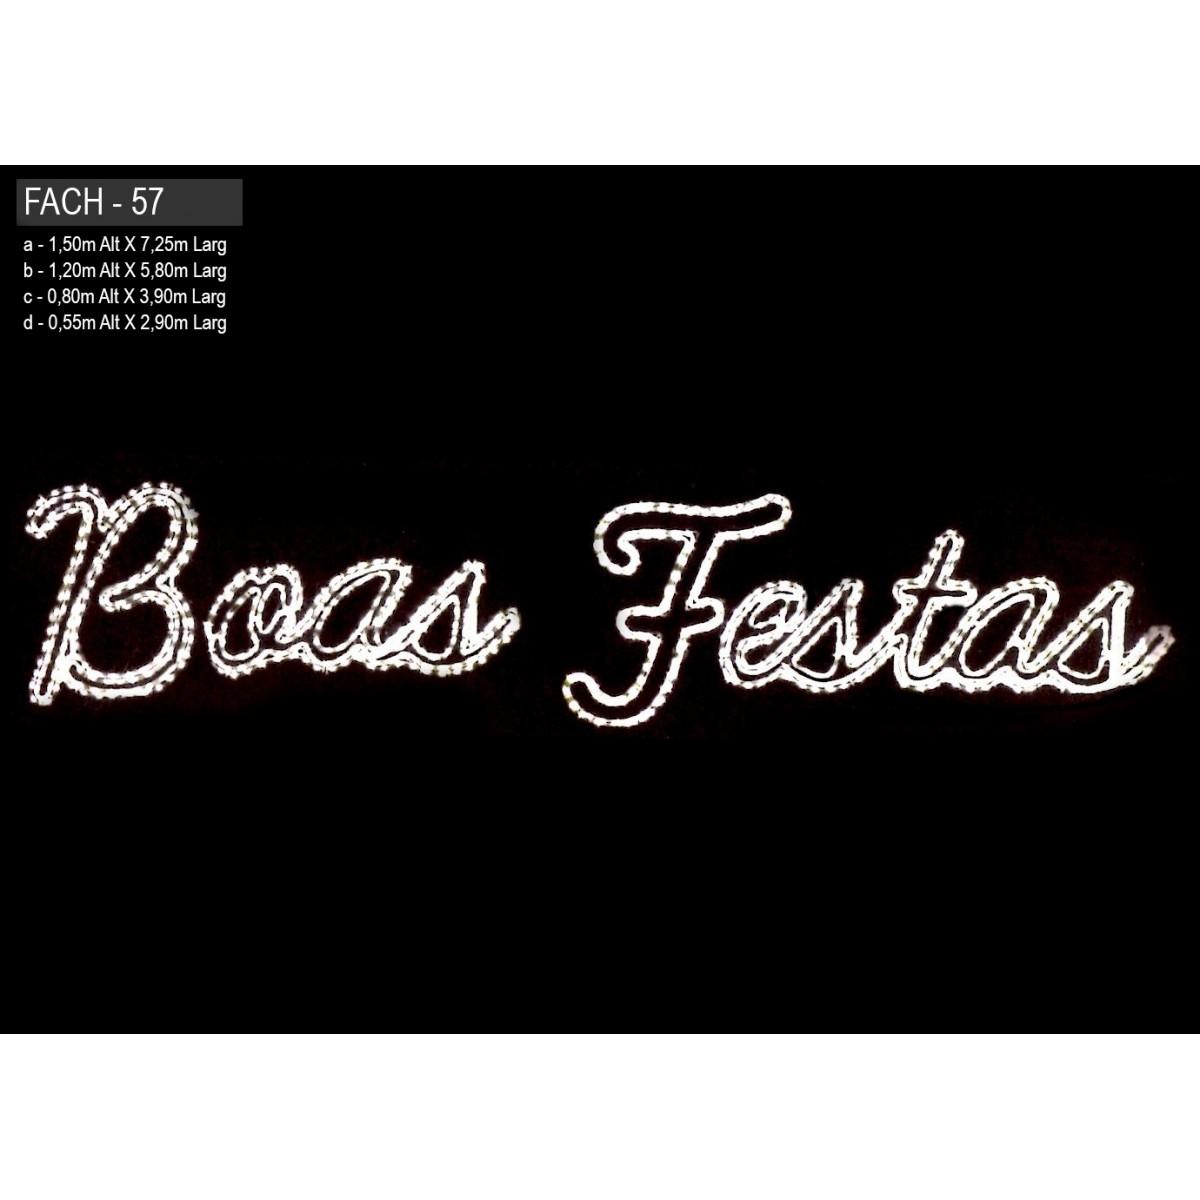 Painel de Natal PN-057-FE/B Iluminado Led - Boas Festa - MED 1,20 x 5,80 mts